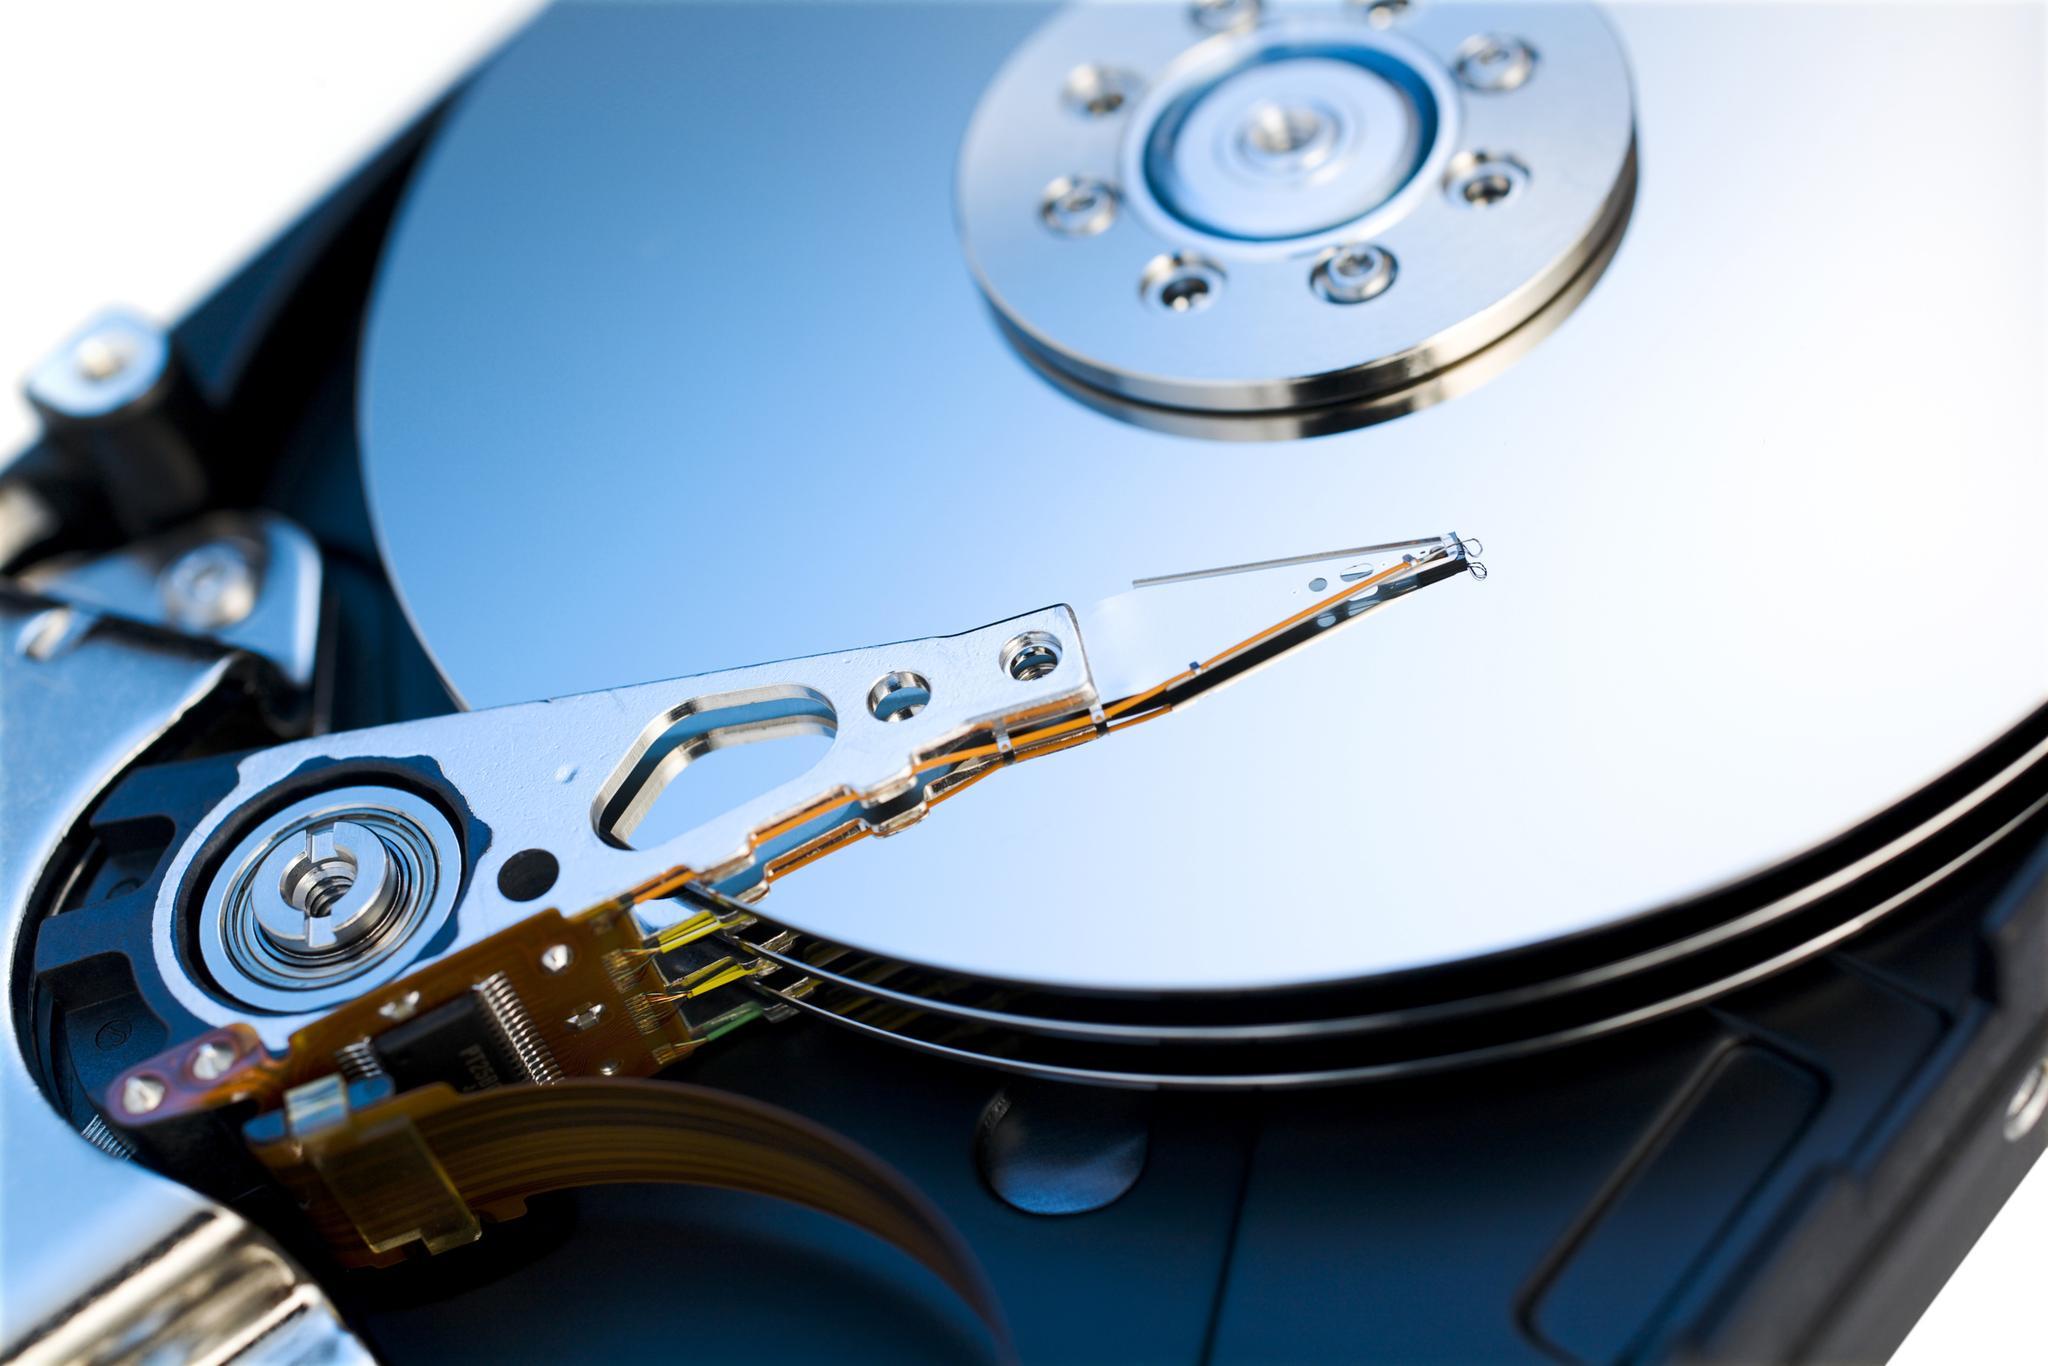 assets/img/hard-drive.jpg